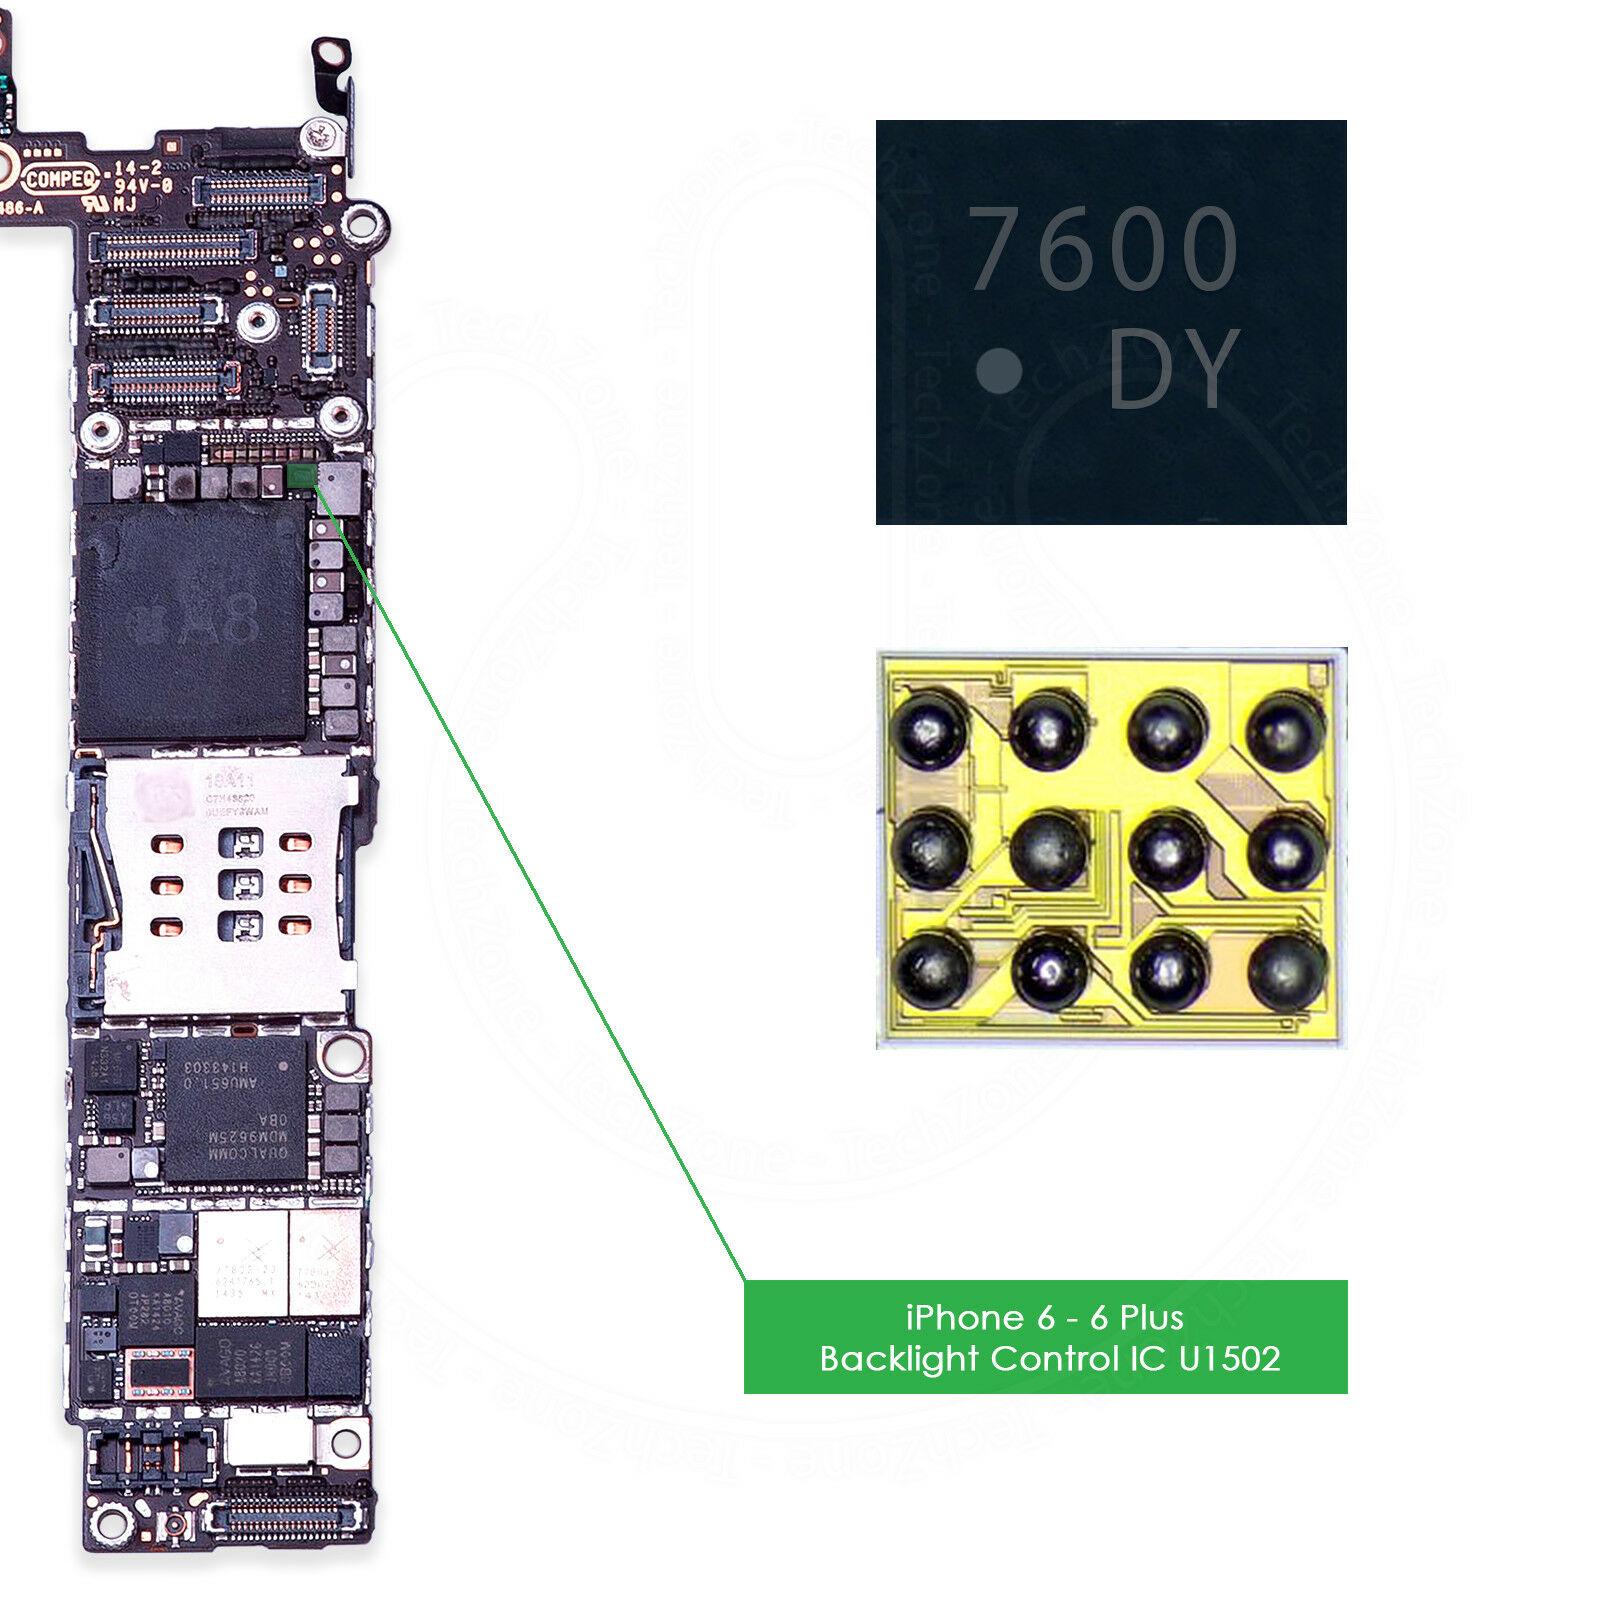 U1502 & U1580 Backlight IC for iPhone 6 & 6 Plus